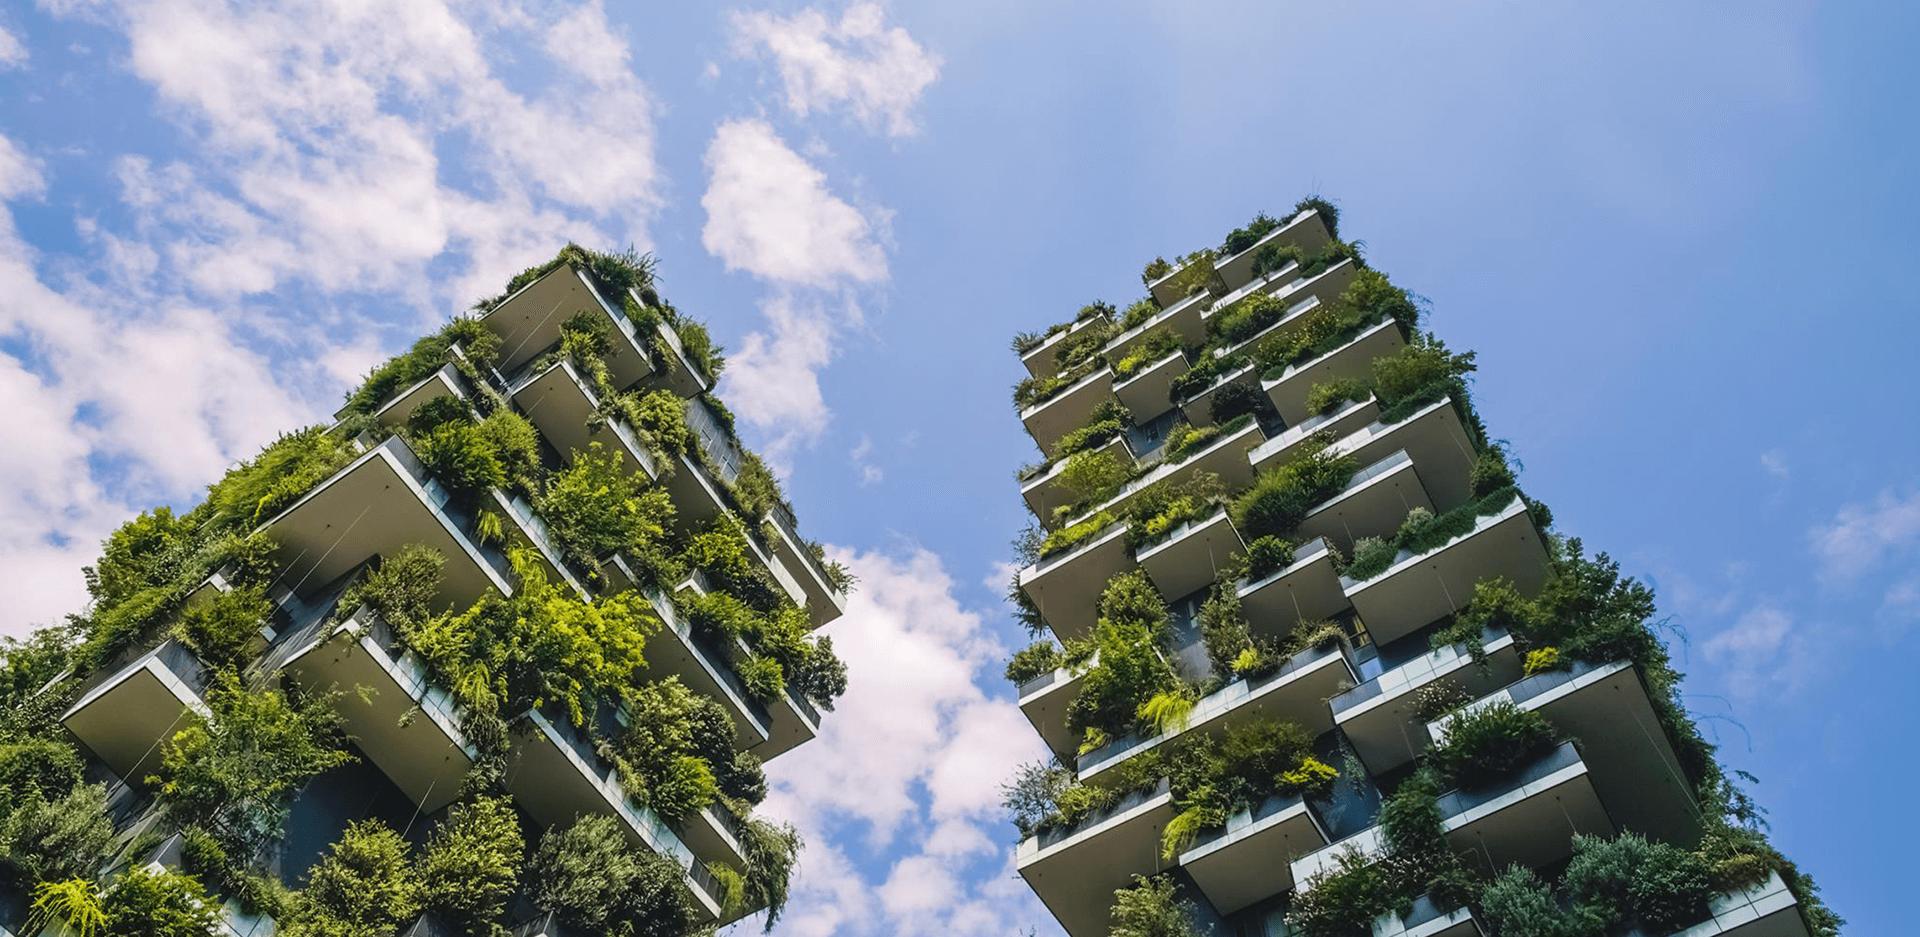 bosco-verticale-photogallery_0